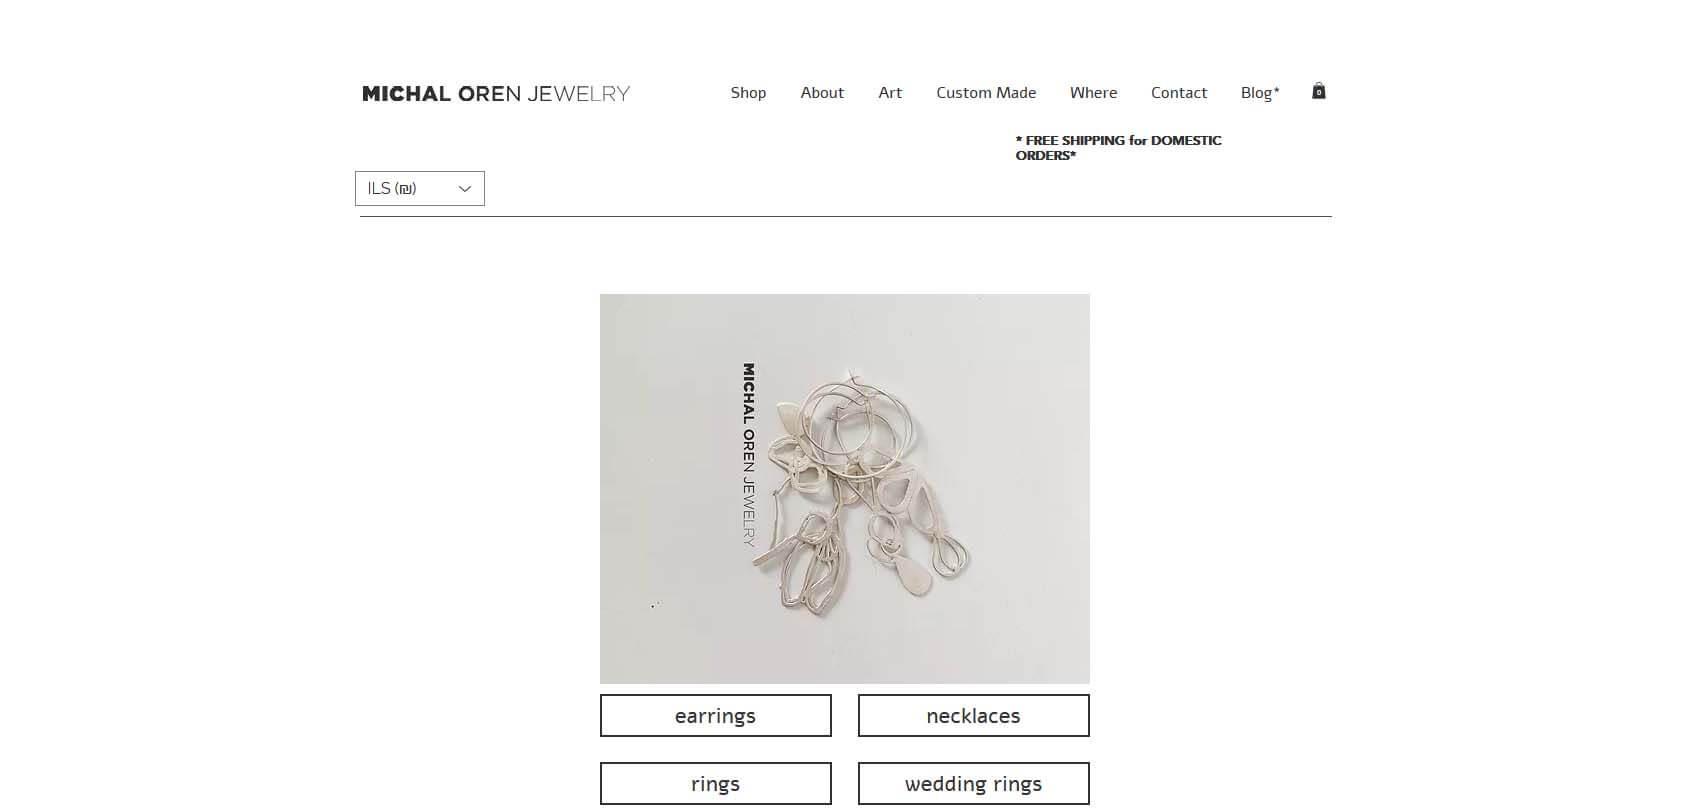 Michal Oren Jewelry Homepage